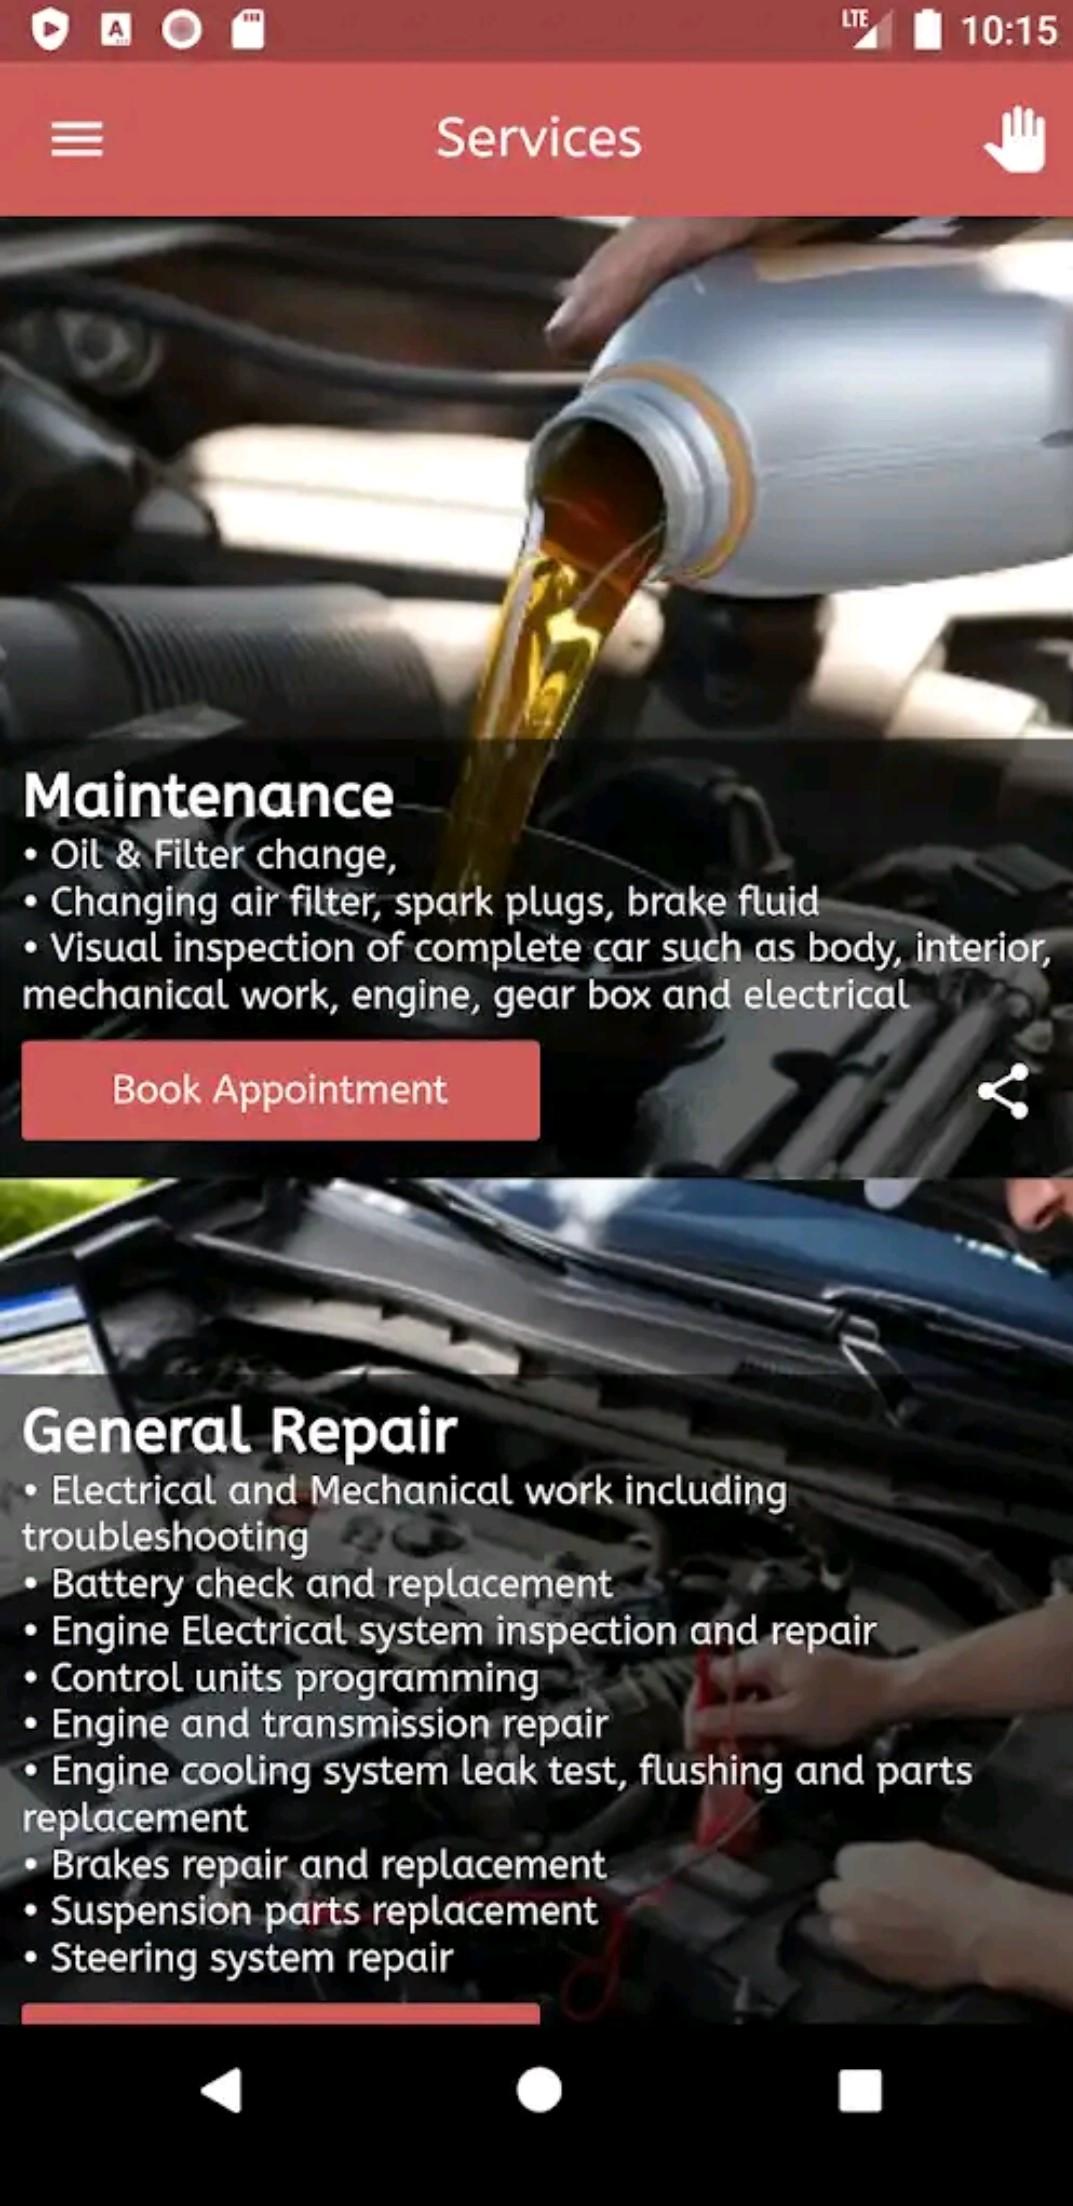 SiAna Auto Services